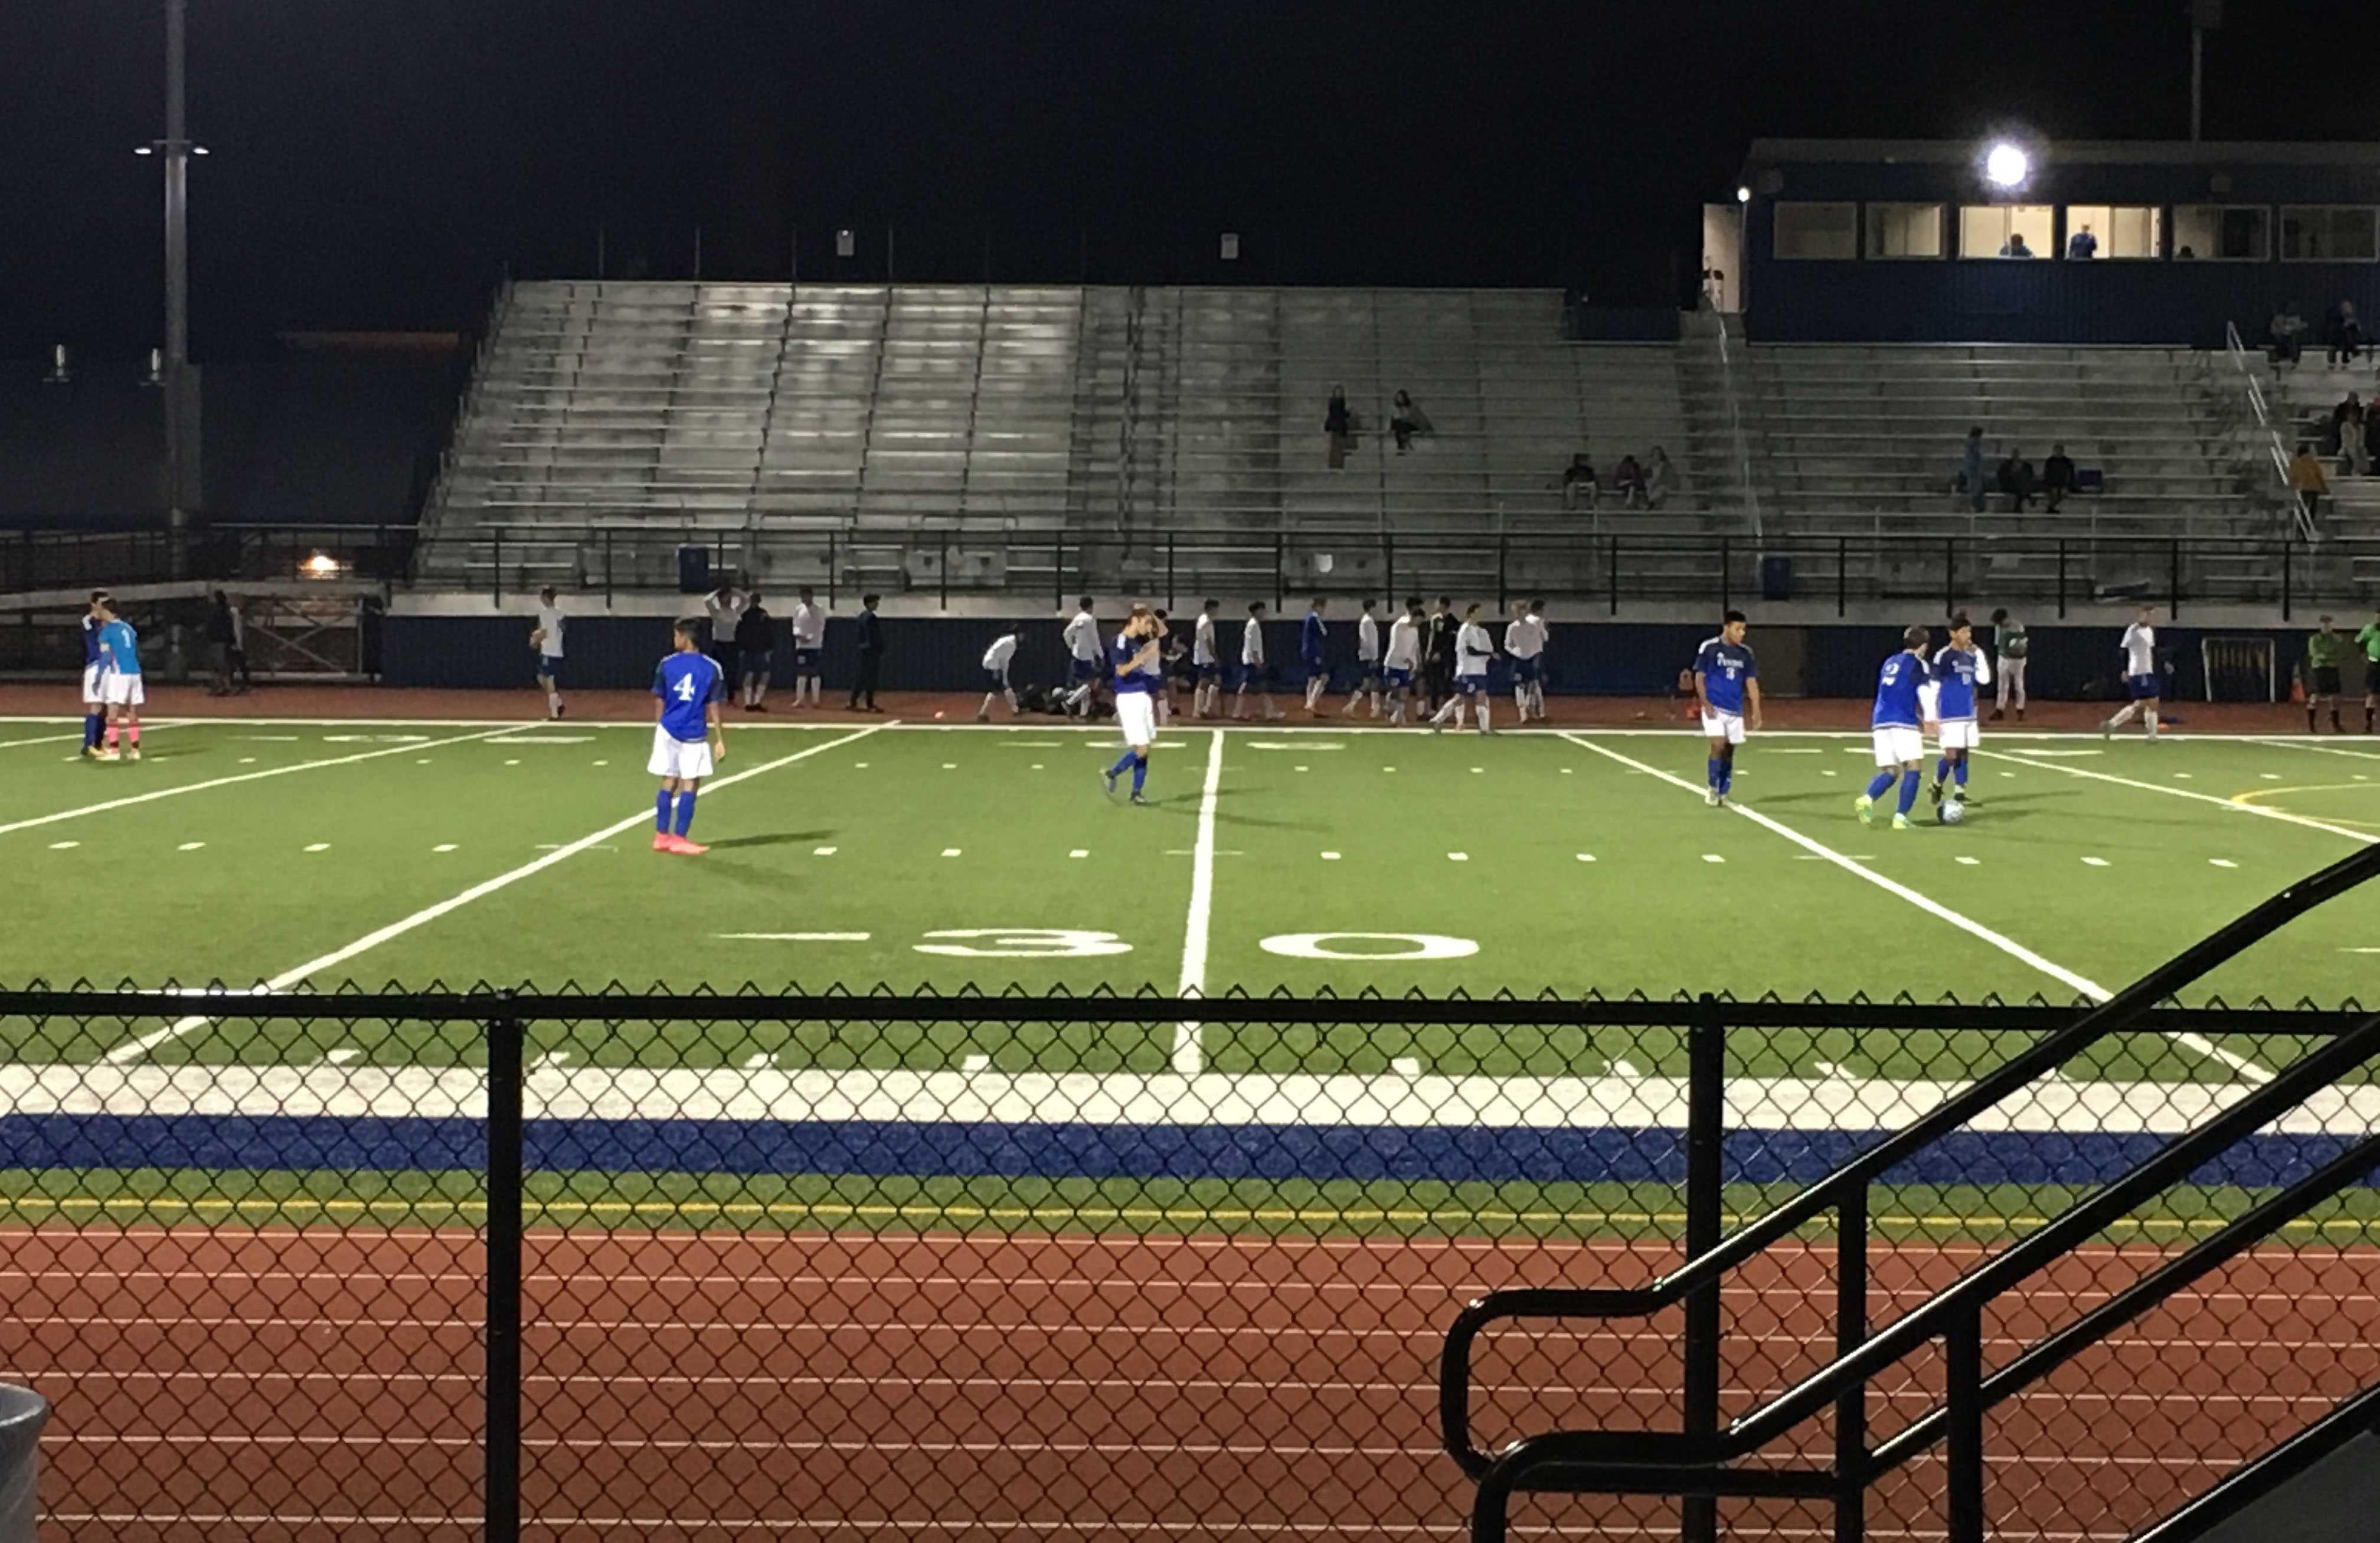 Boys soccer against Fenton